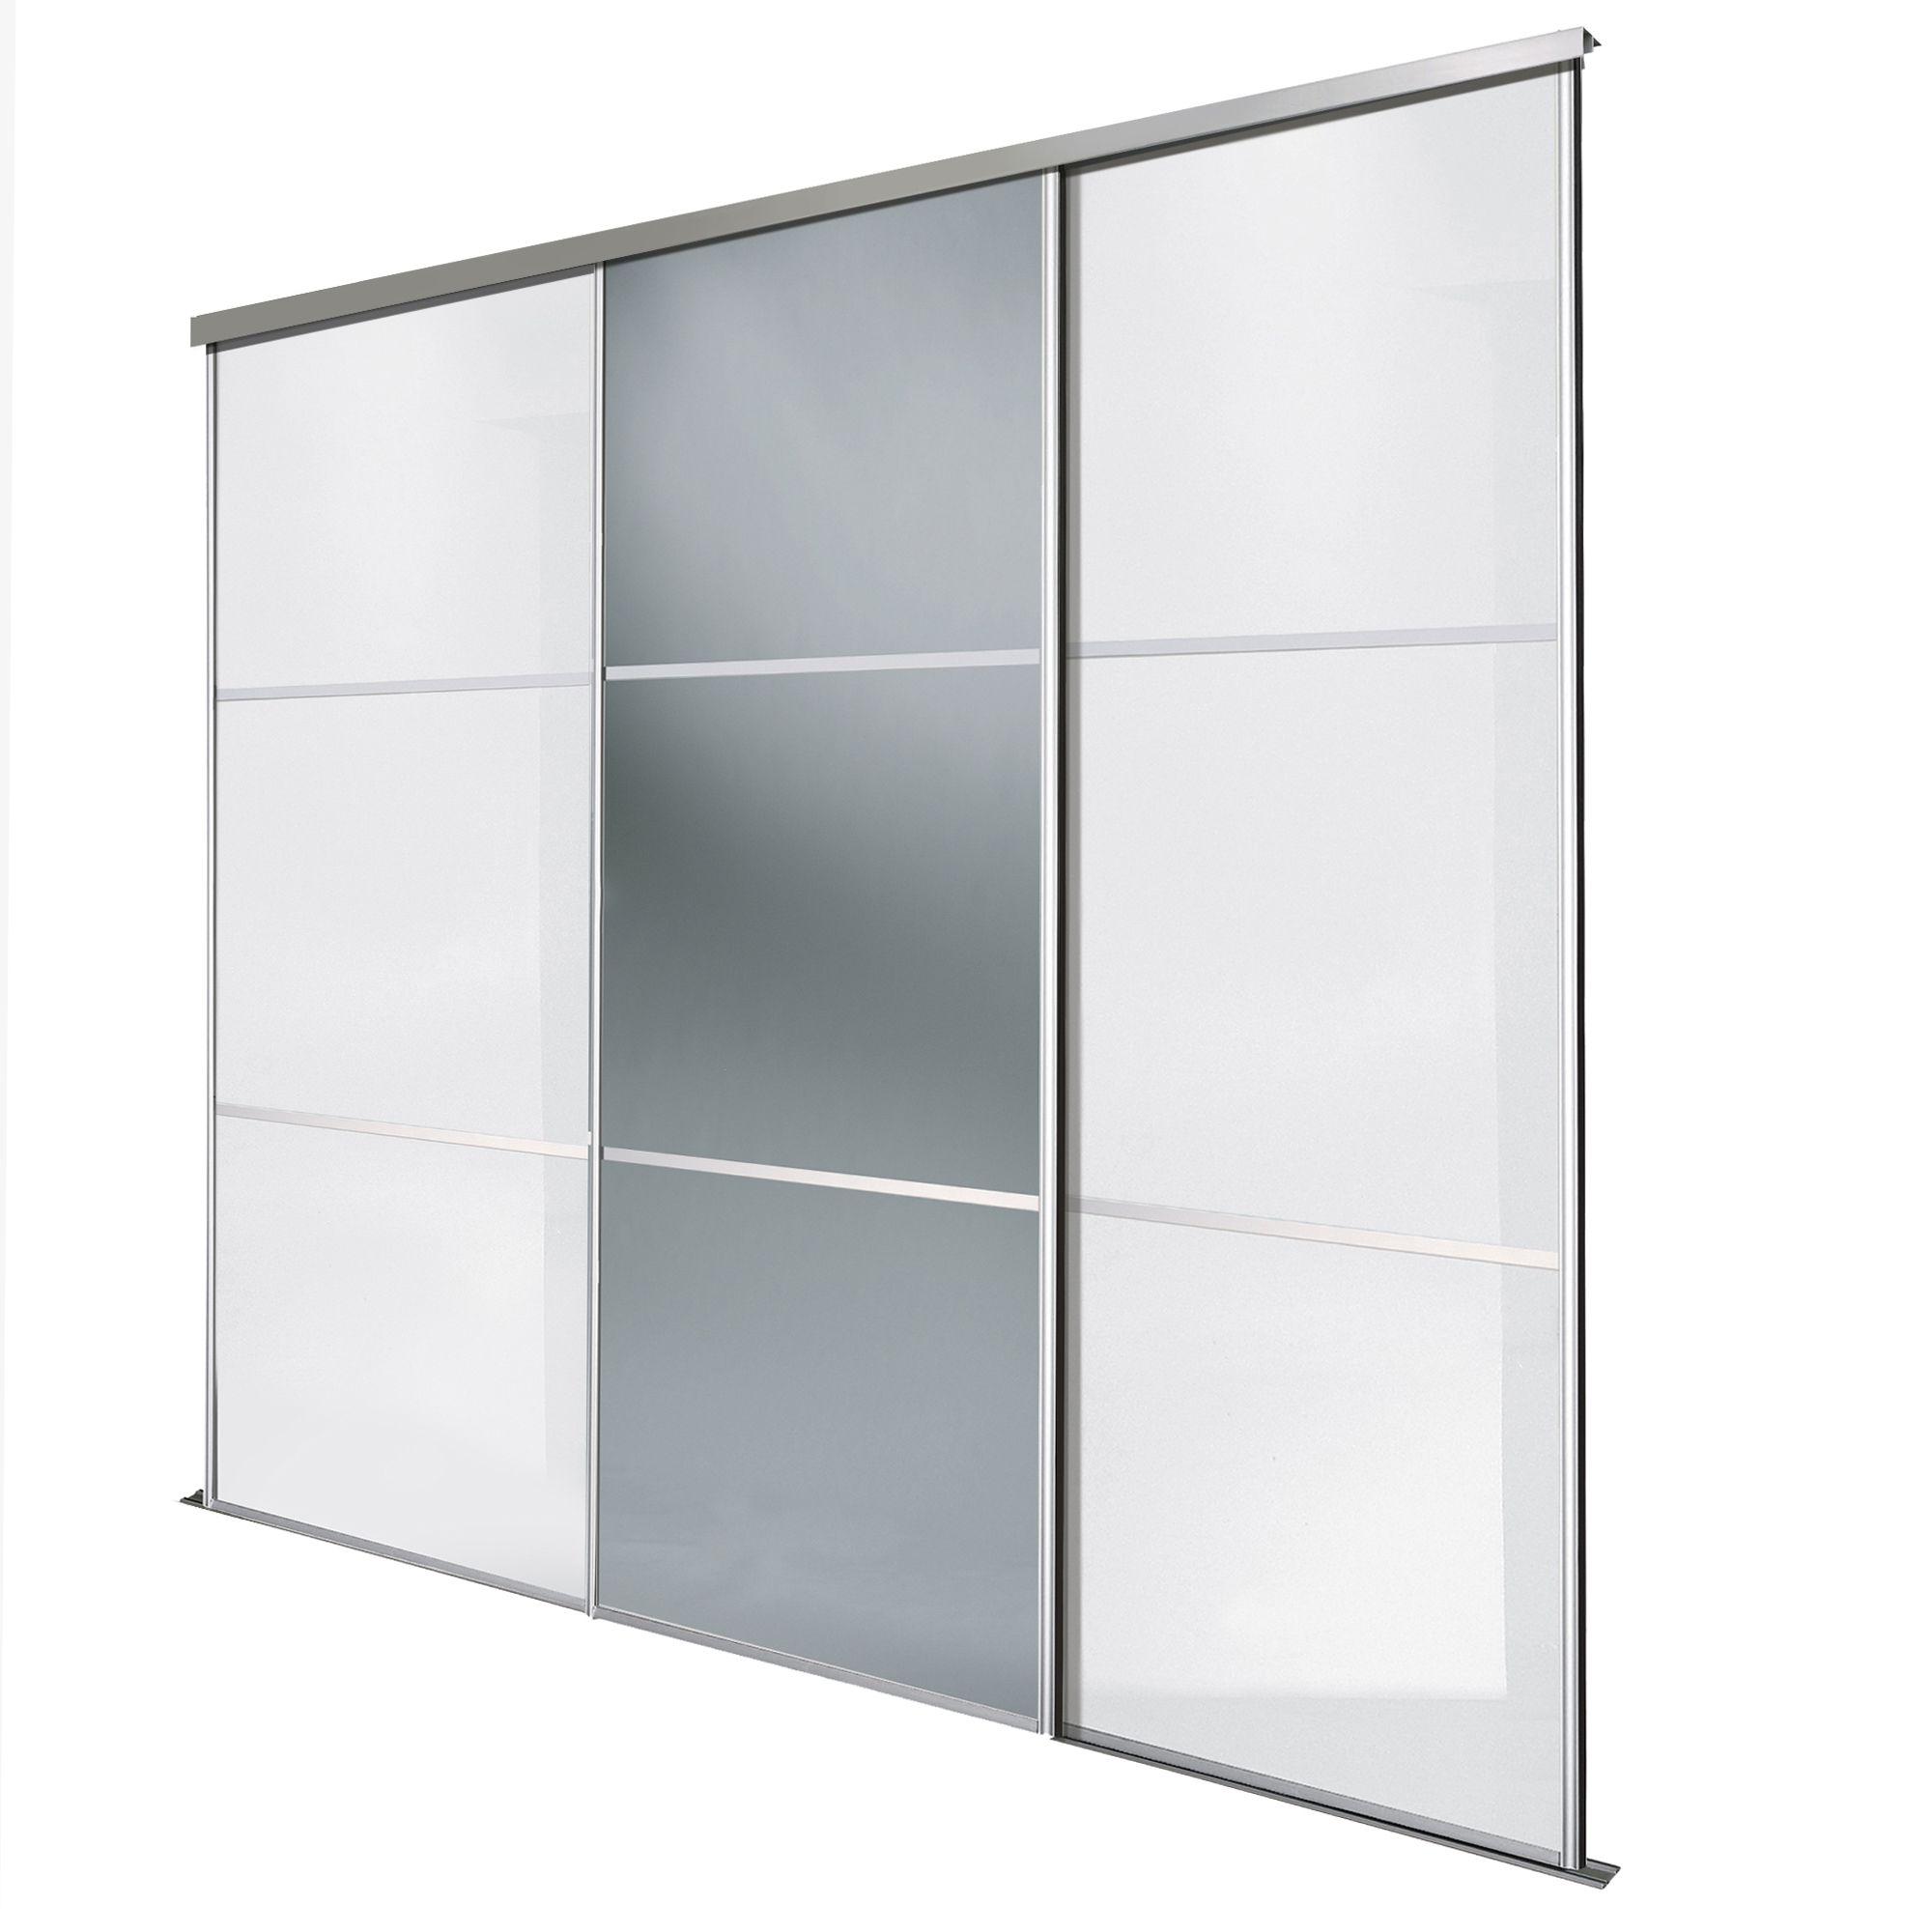 Premium Select White & Smoked Grey Mirror Sliding Wardrobe Door Pertaining To Latest White Gloss Sliding Wardrobes (View 12 of 15)